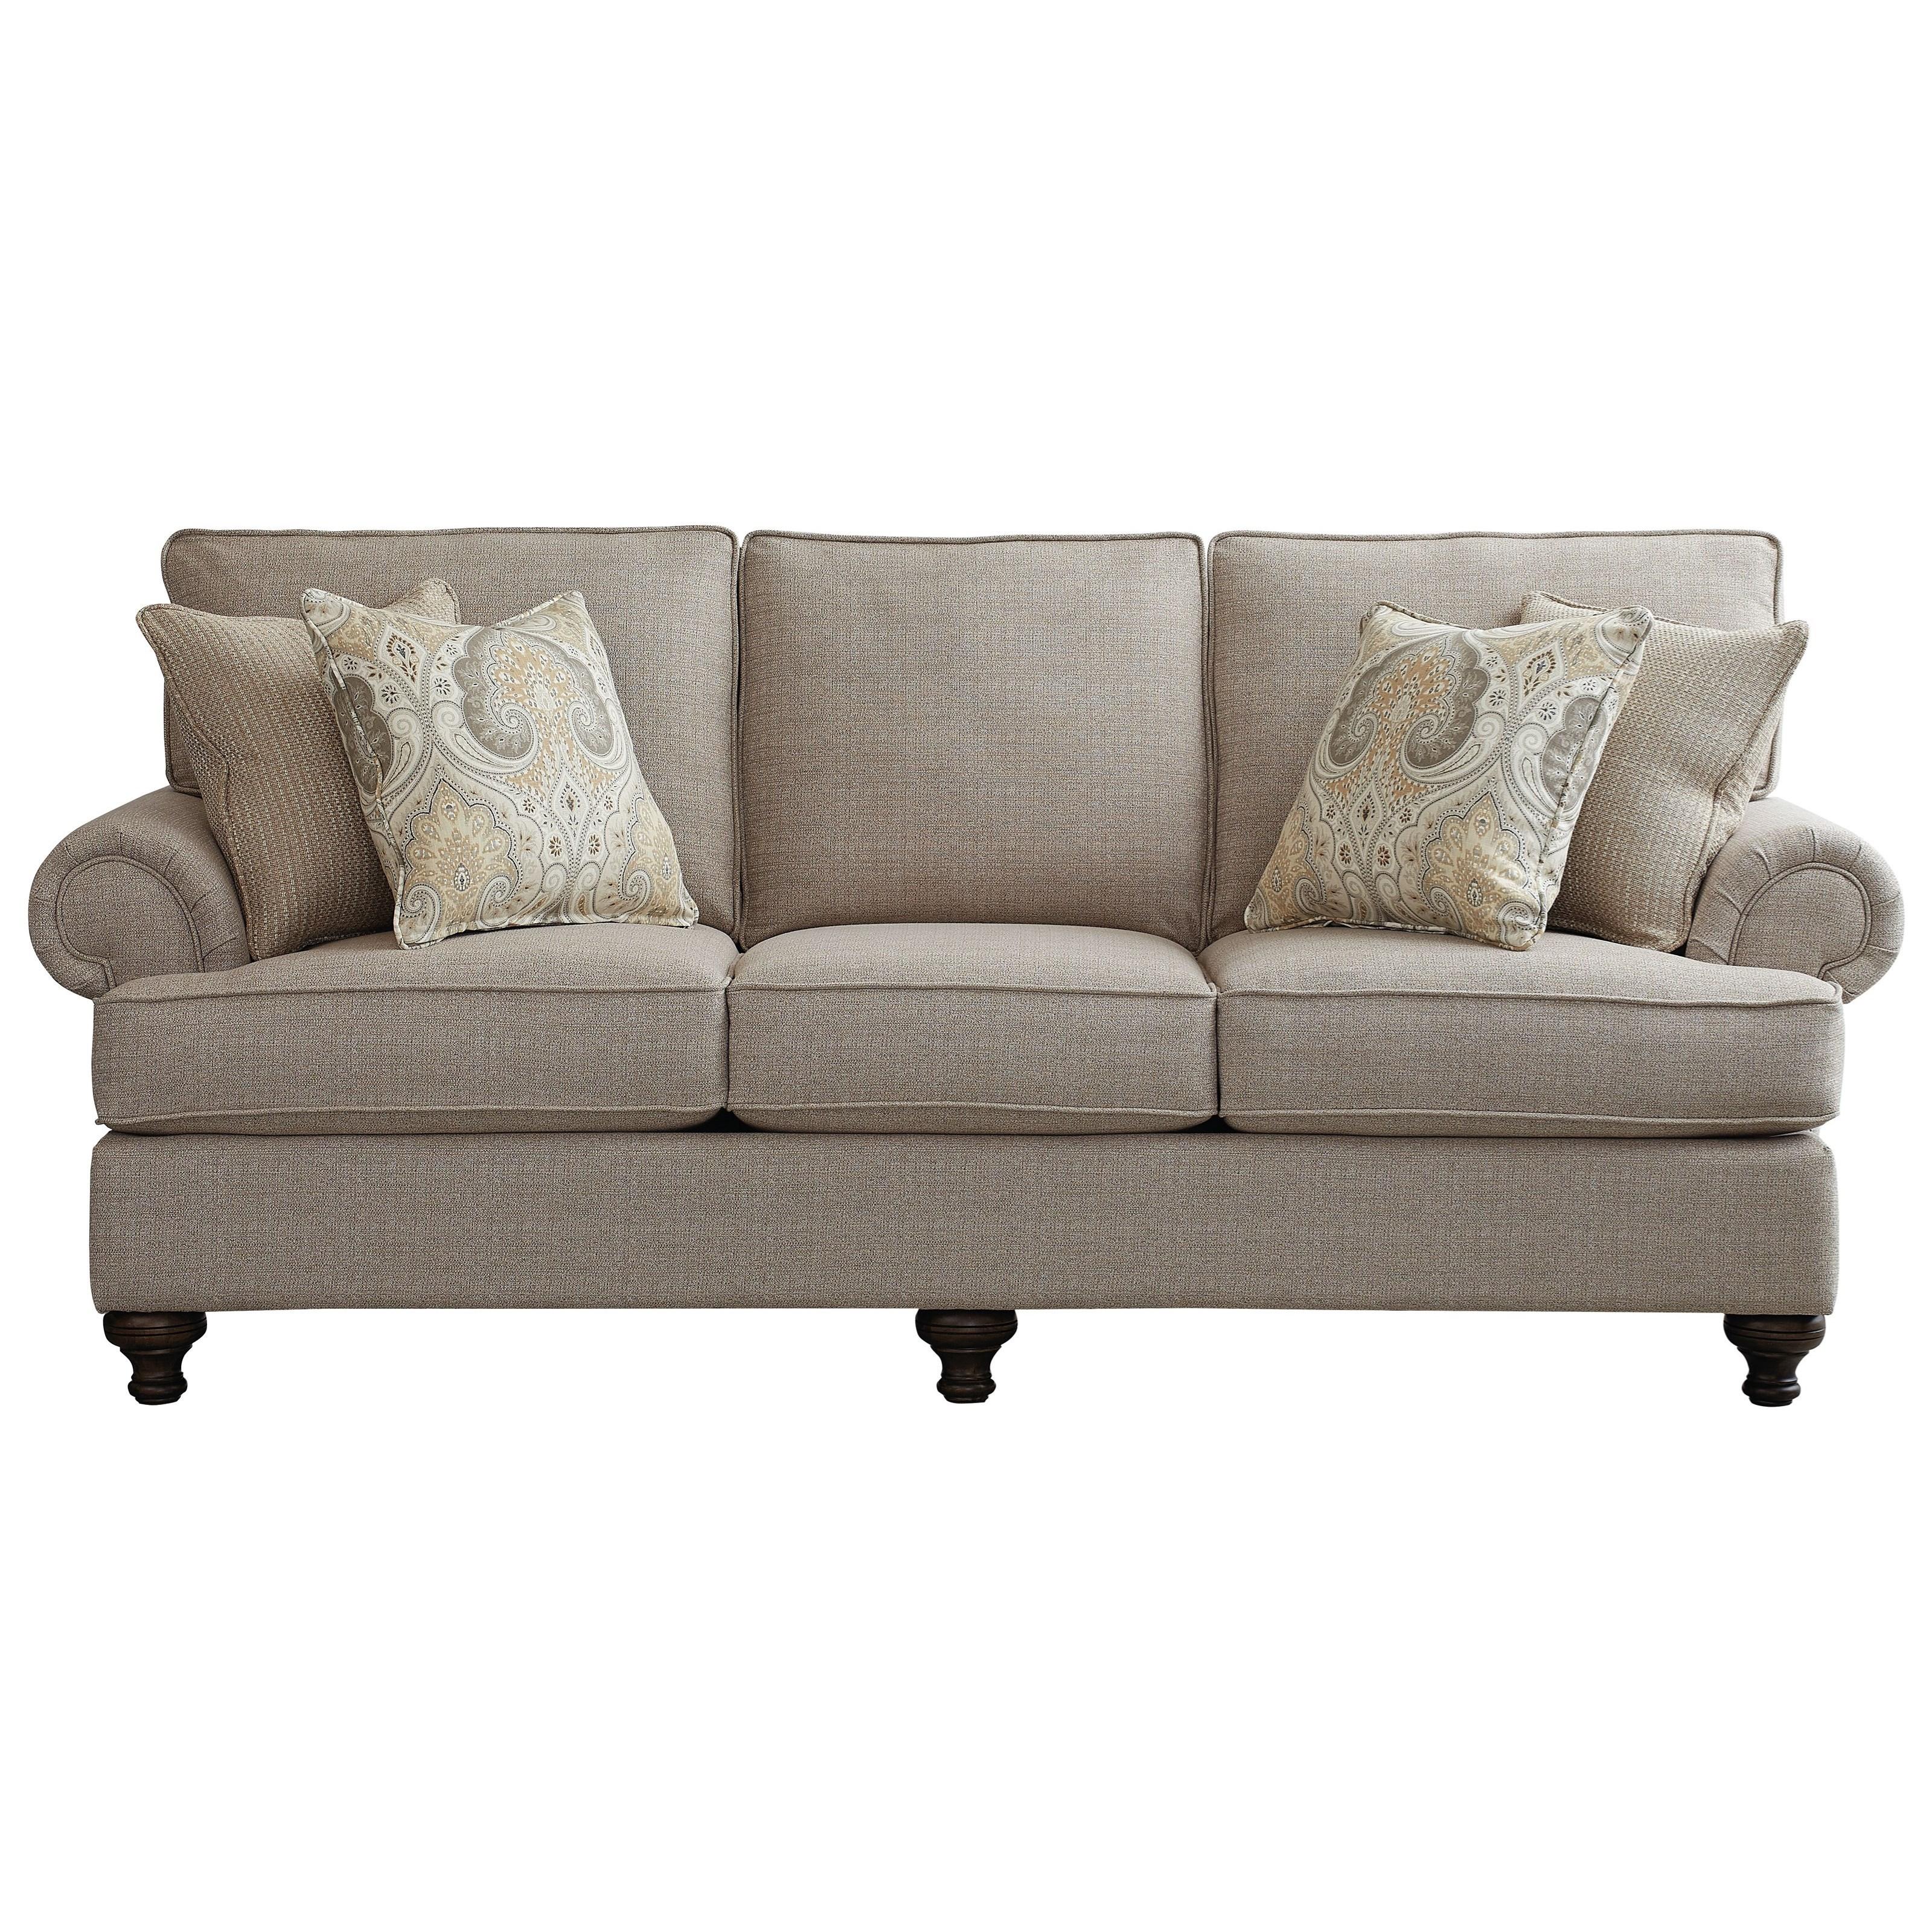 Madison Queen Sleeper Sofa by Bassett at Bassett of Cool Springs